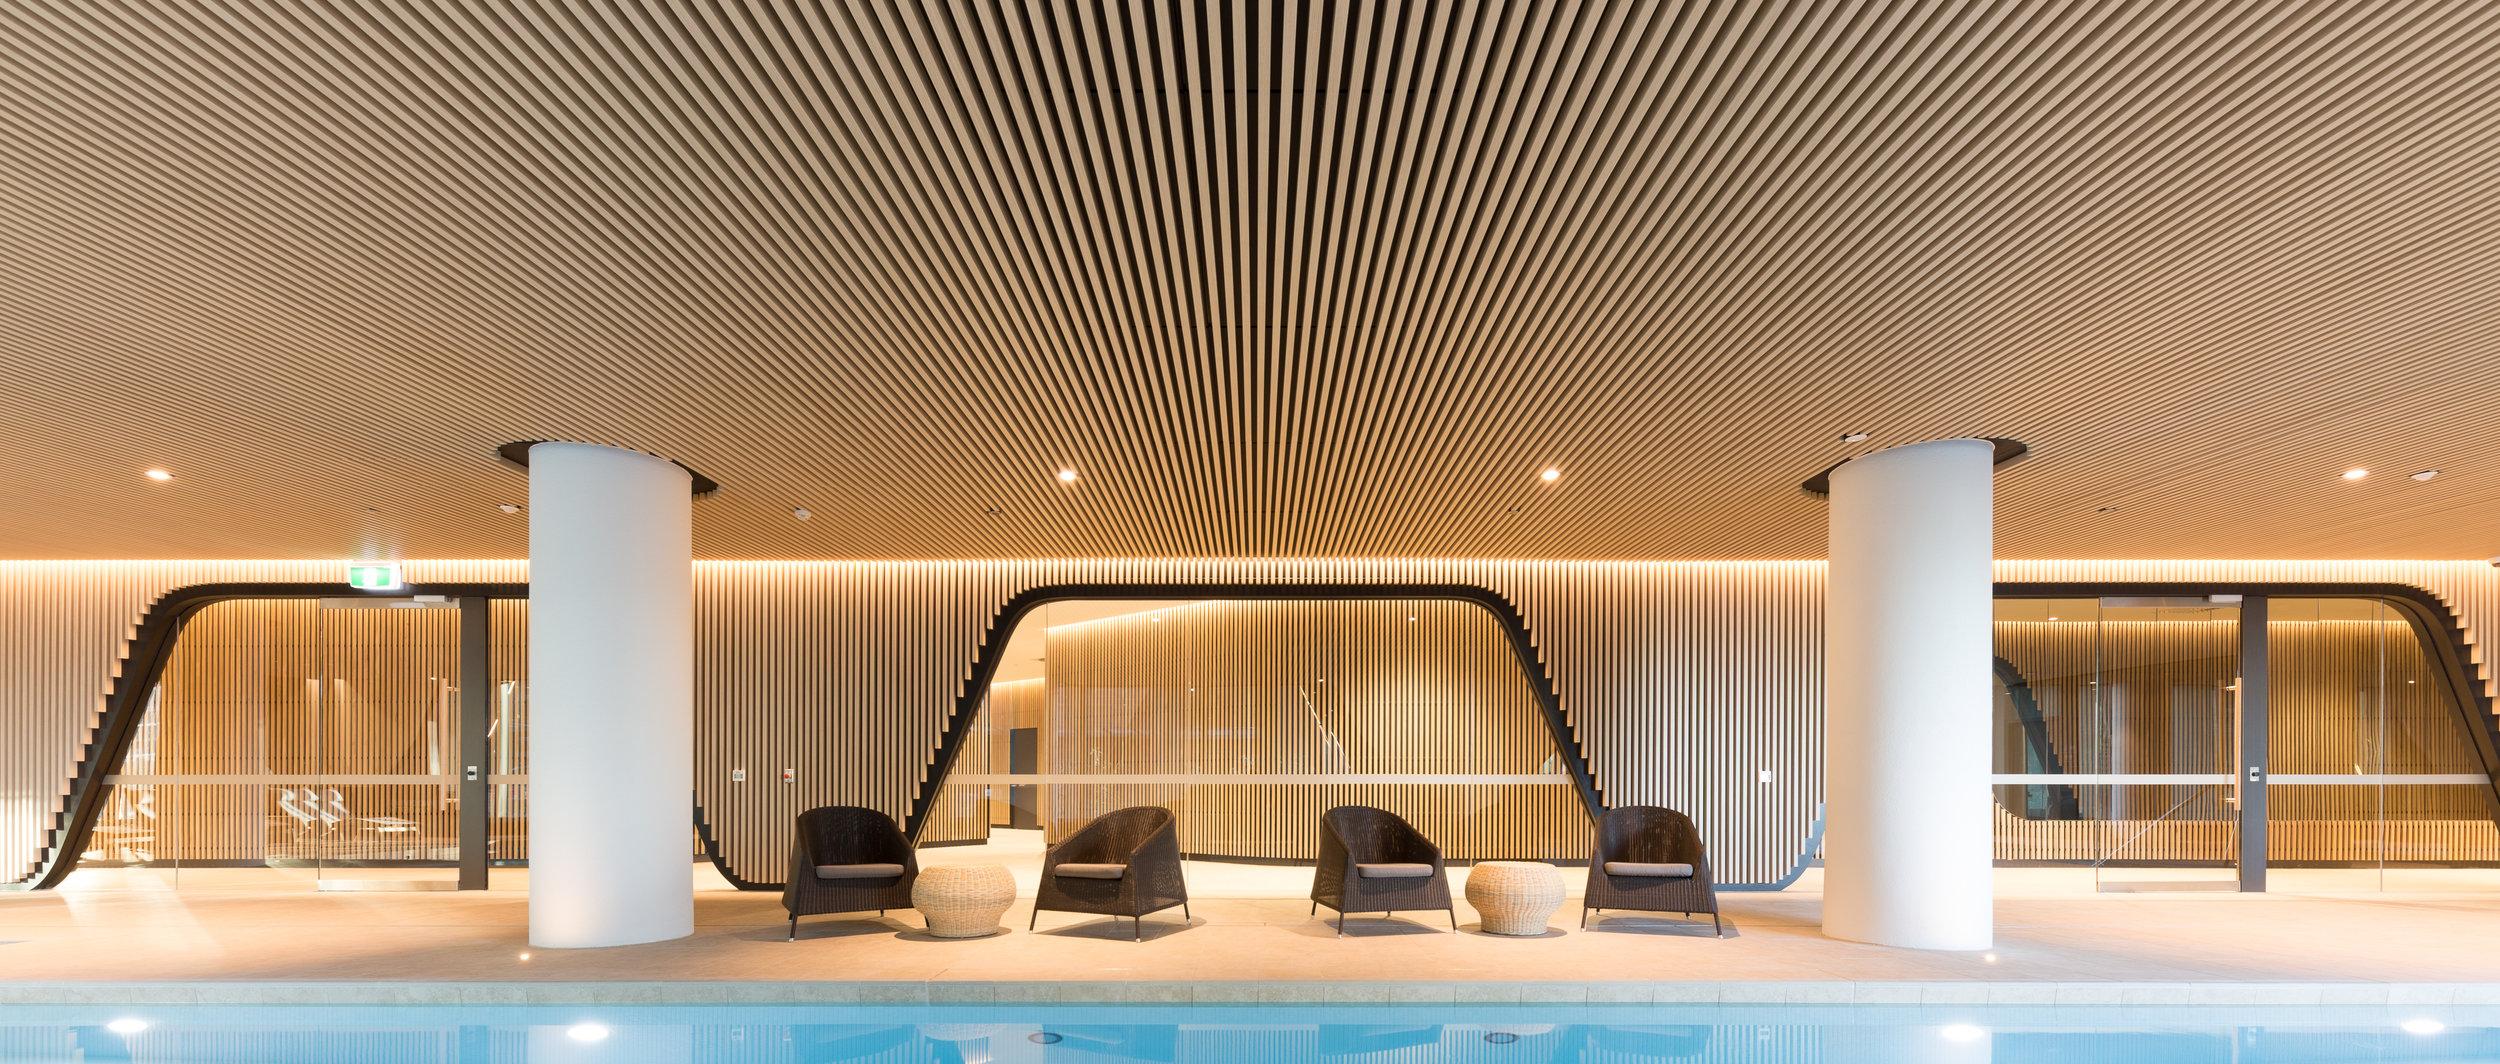 883 Collins St, Melbourne Multi residential Pool Amenitites